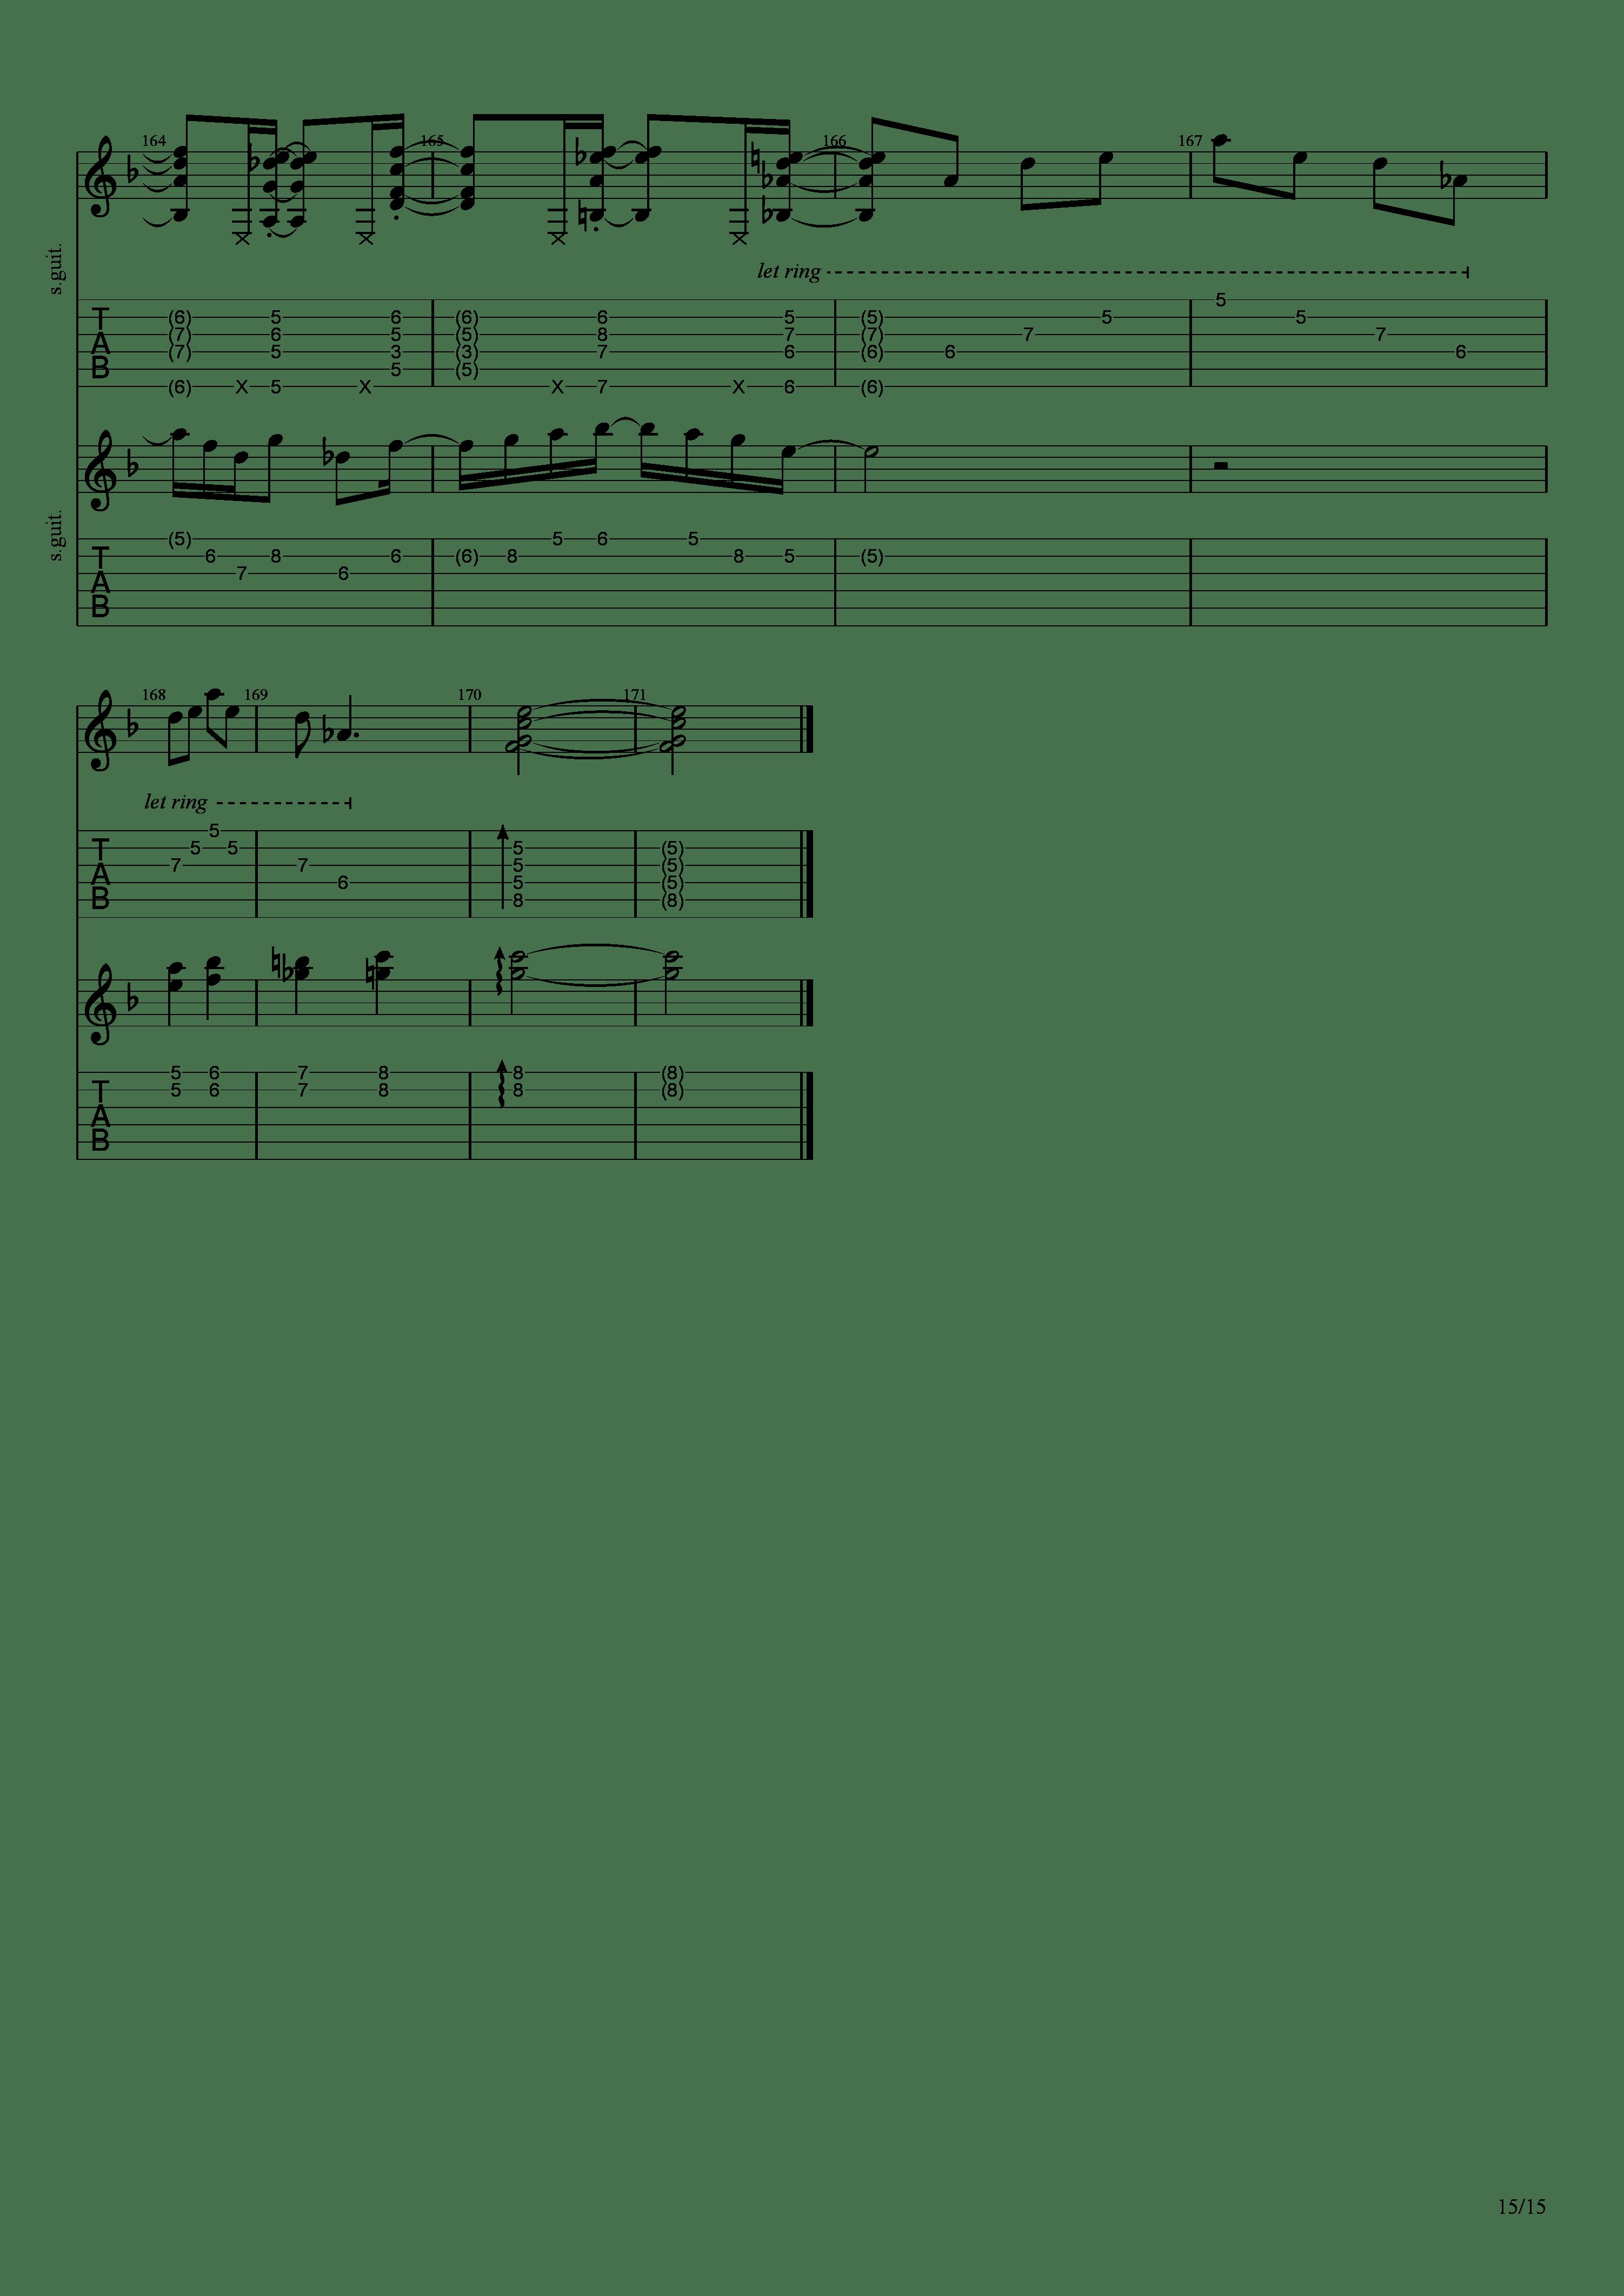 Labyrinth (松井佑贵&井草圣二)吉他谱15